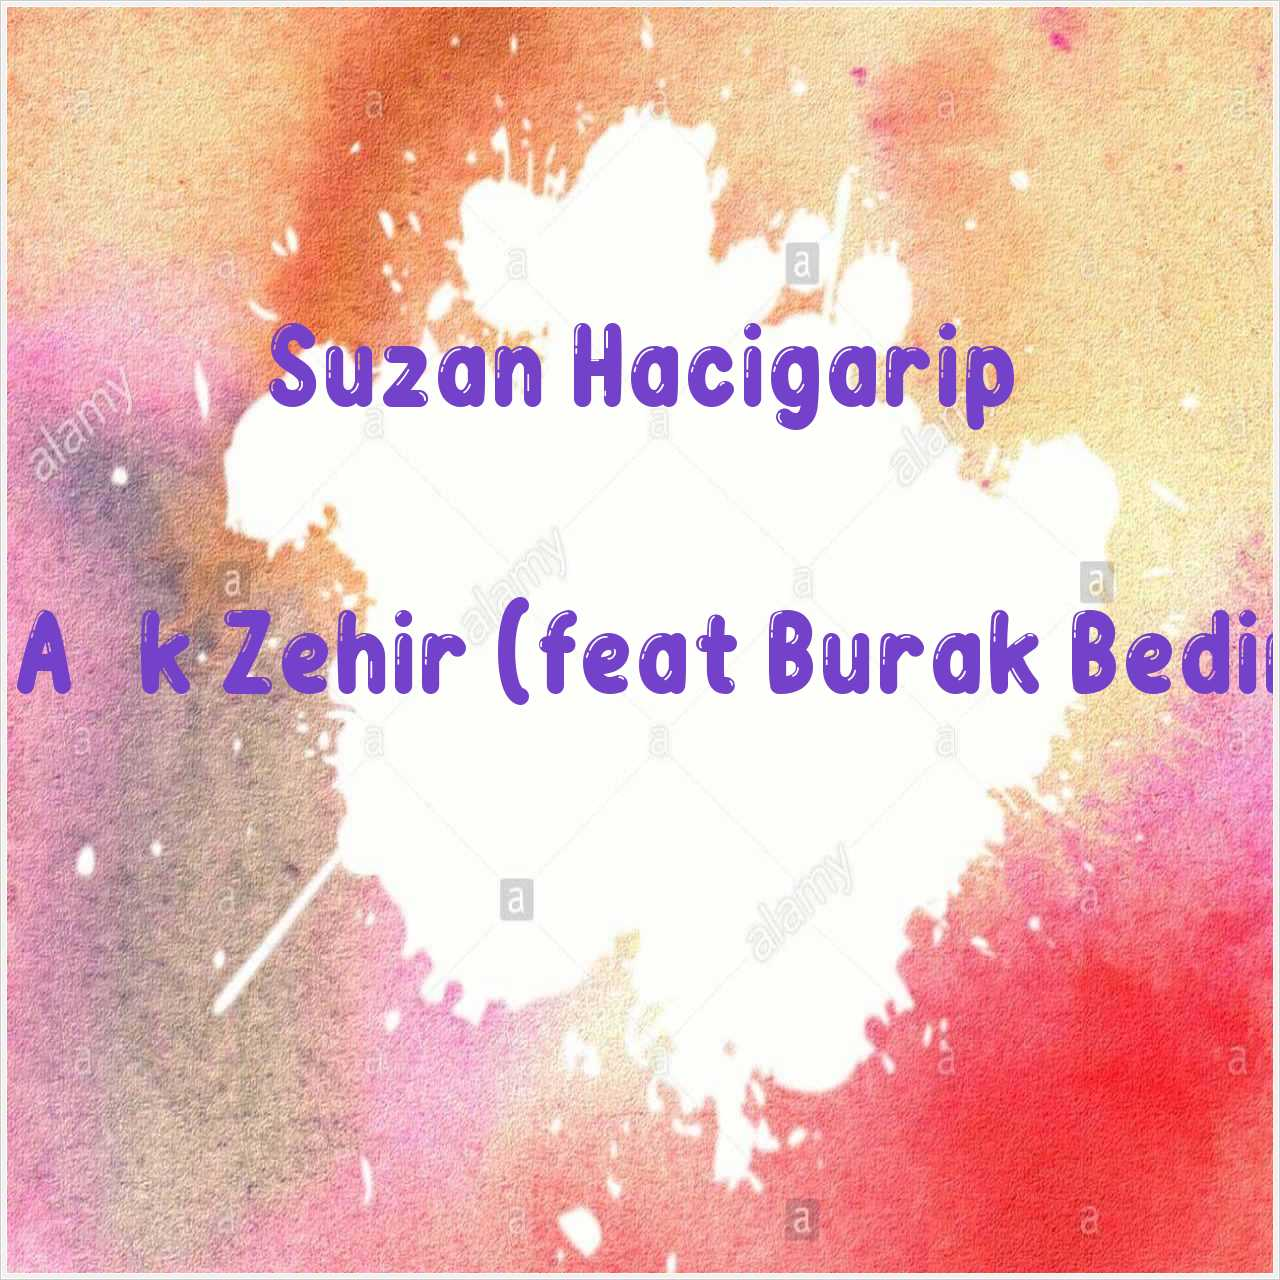 دانلود آهنگ جدید Suzan Hacigarip به نام Bu Aşk Zehir (feat Burak Bedirli)